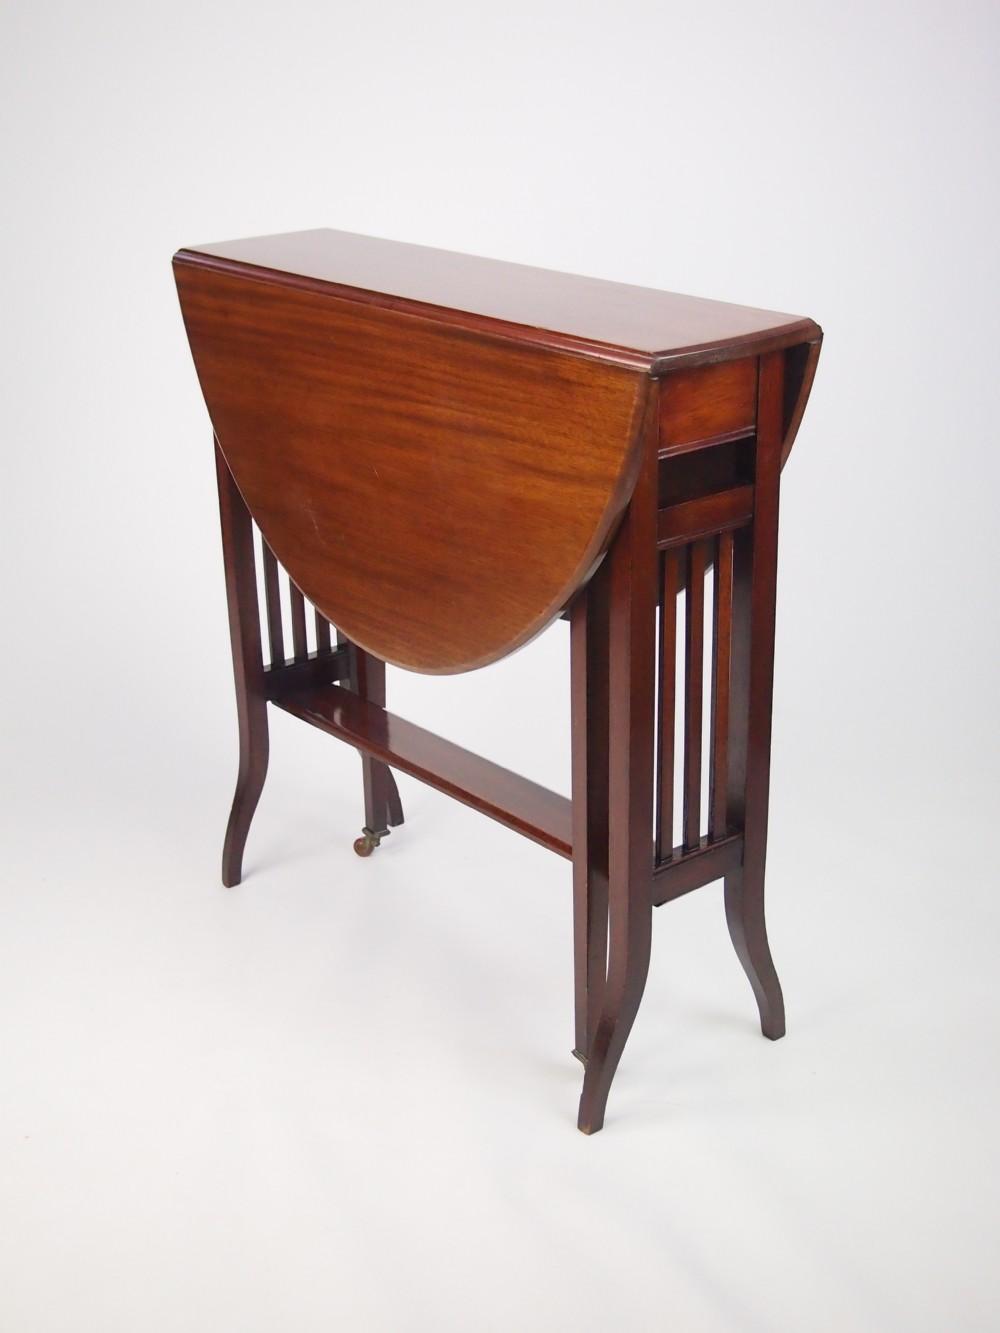 Selling Antique Furniture